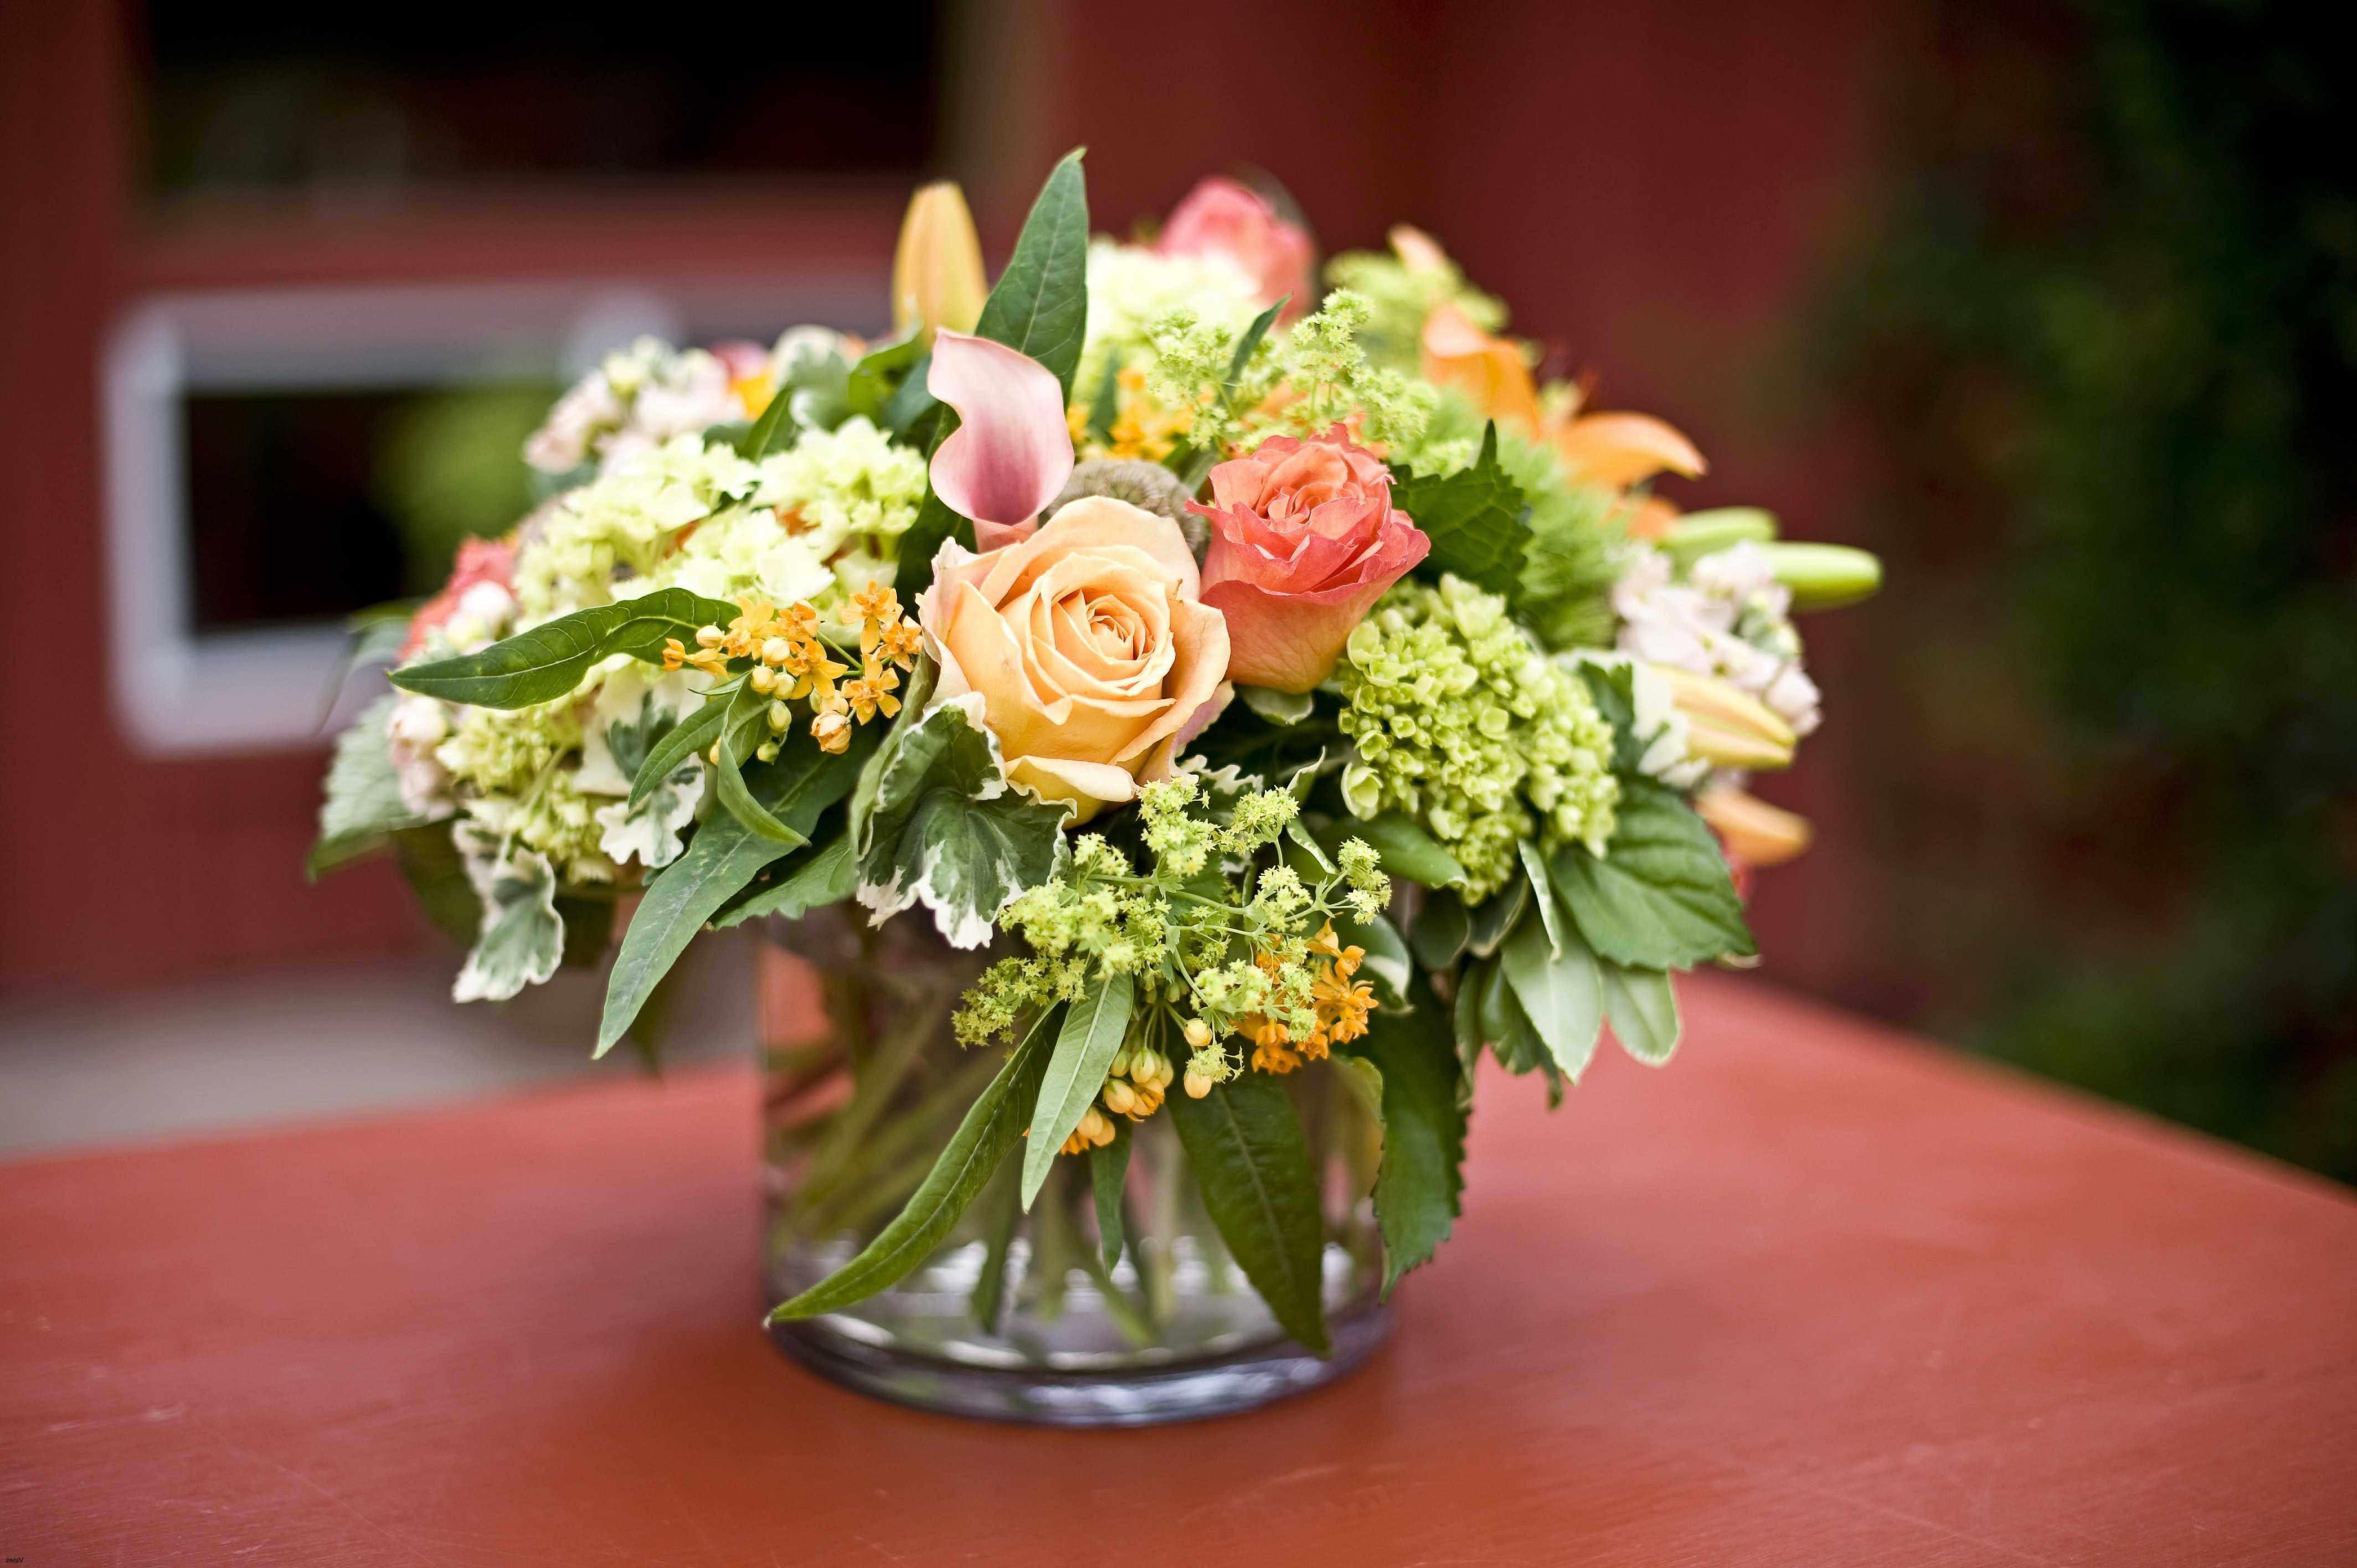 71 2BhQGjWZvL SL1163 H Vases Send Flowers Without Vase Amazon 25 Long Stem Roses Rainbow Bouquet